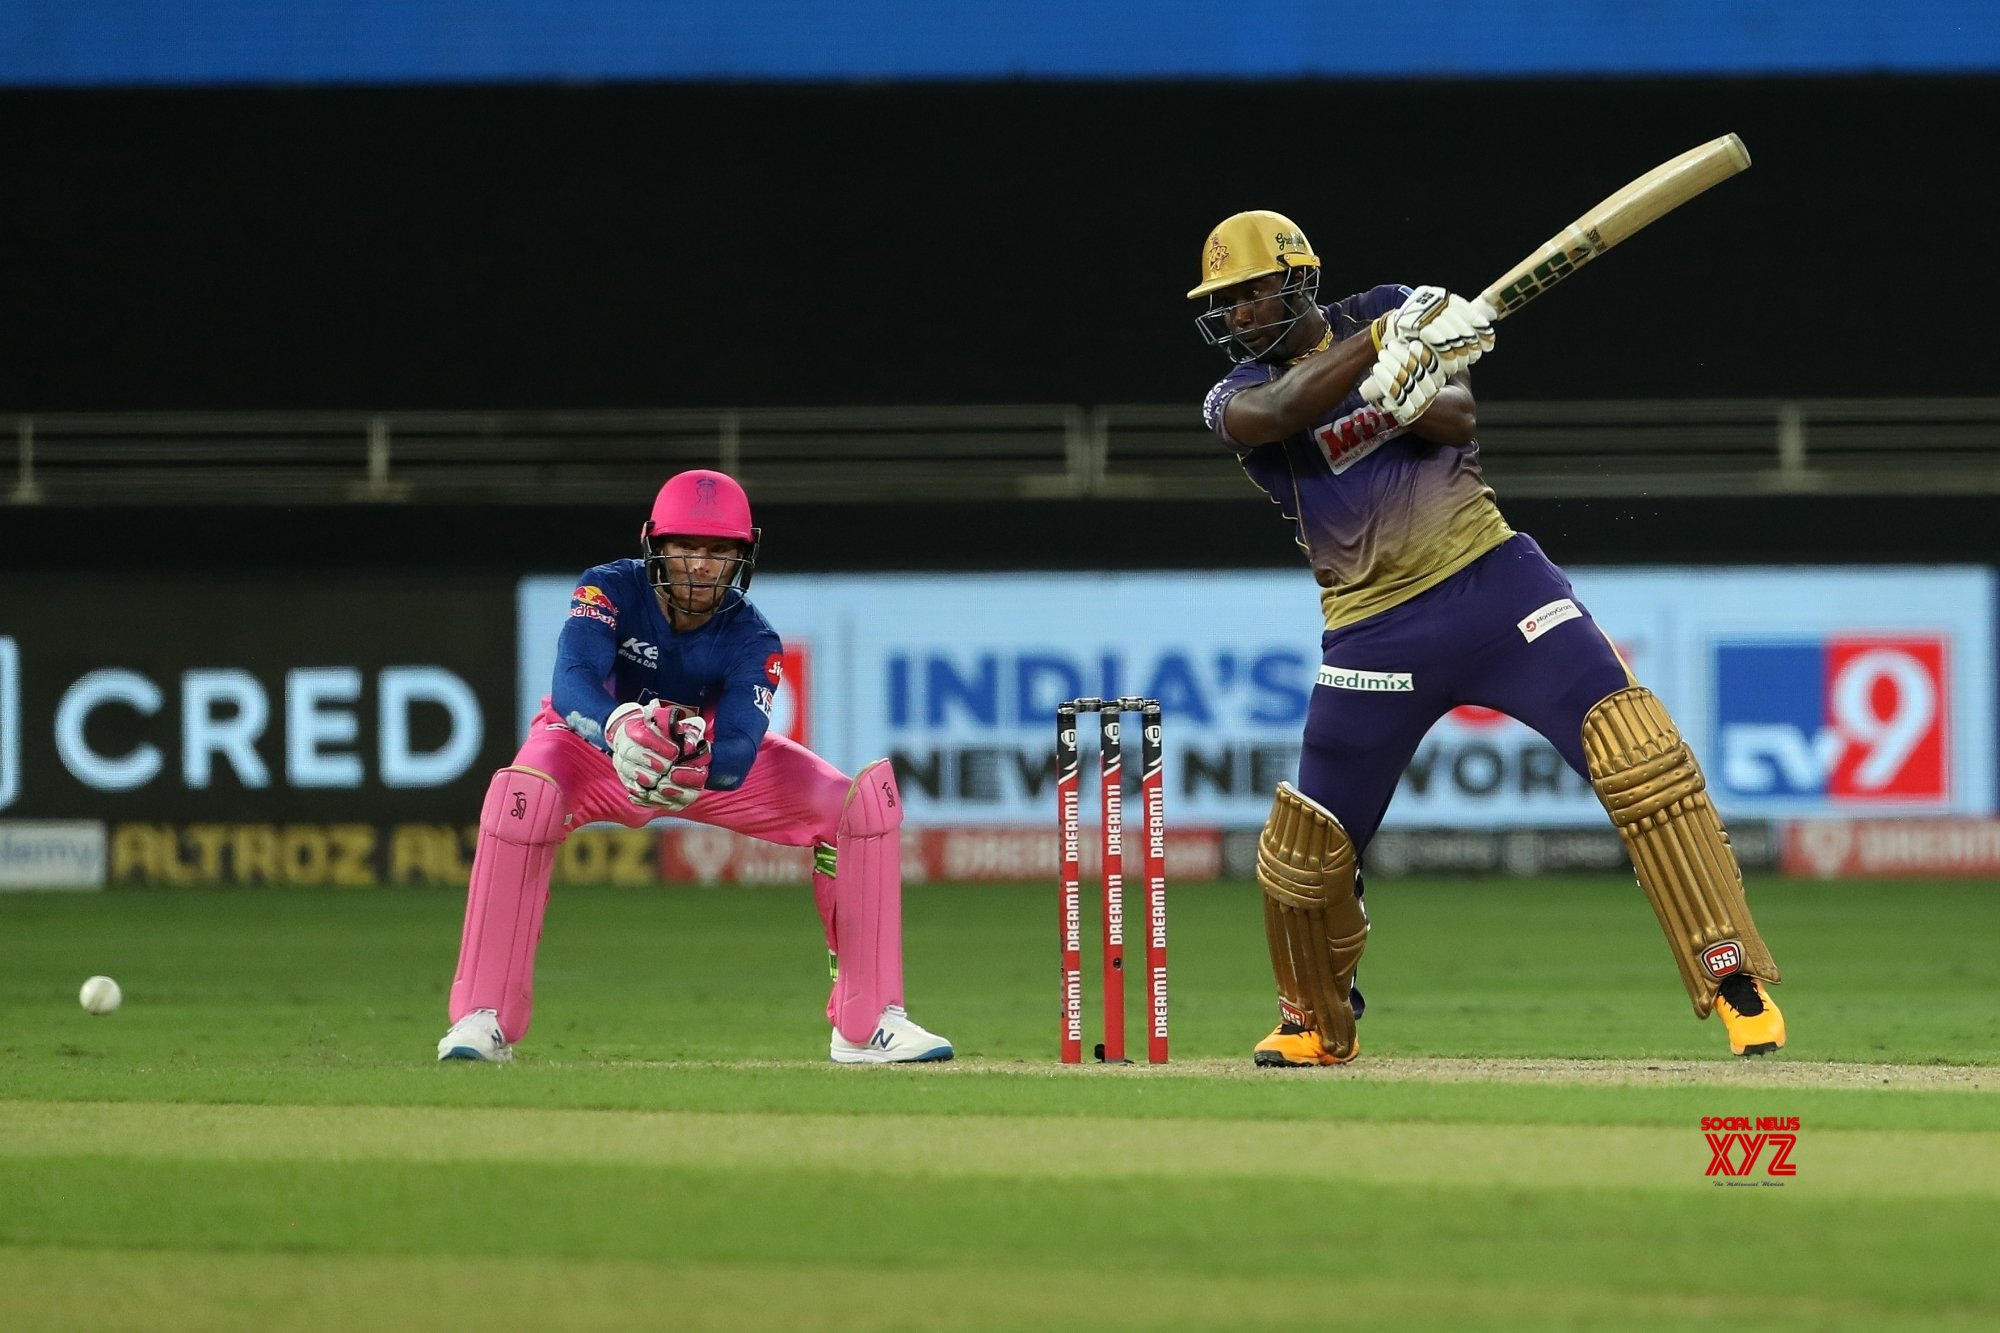 IPL 2020: Dinesh Karthik hands over KKR captaincy to Eoin Morgan